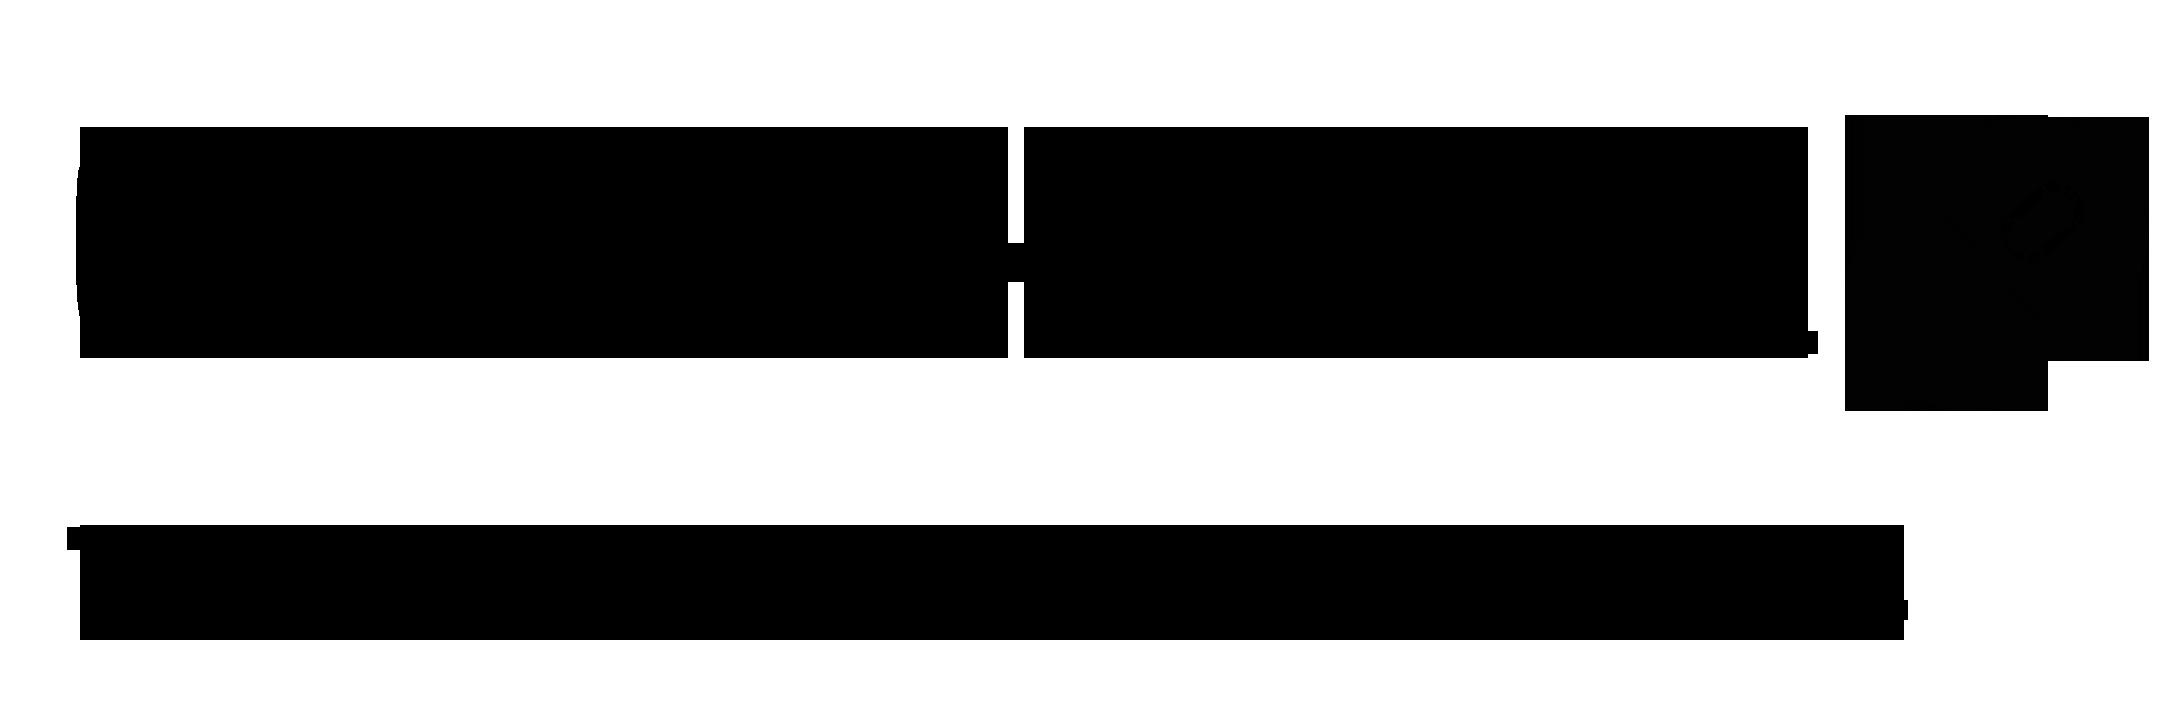 logo_compusave_transparent